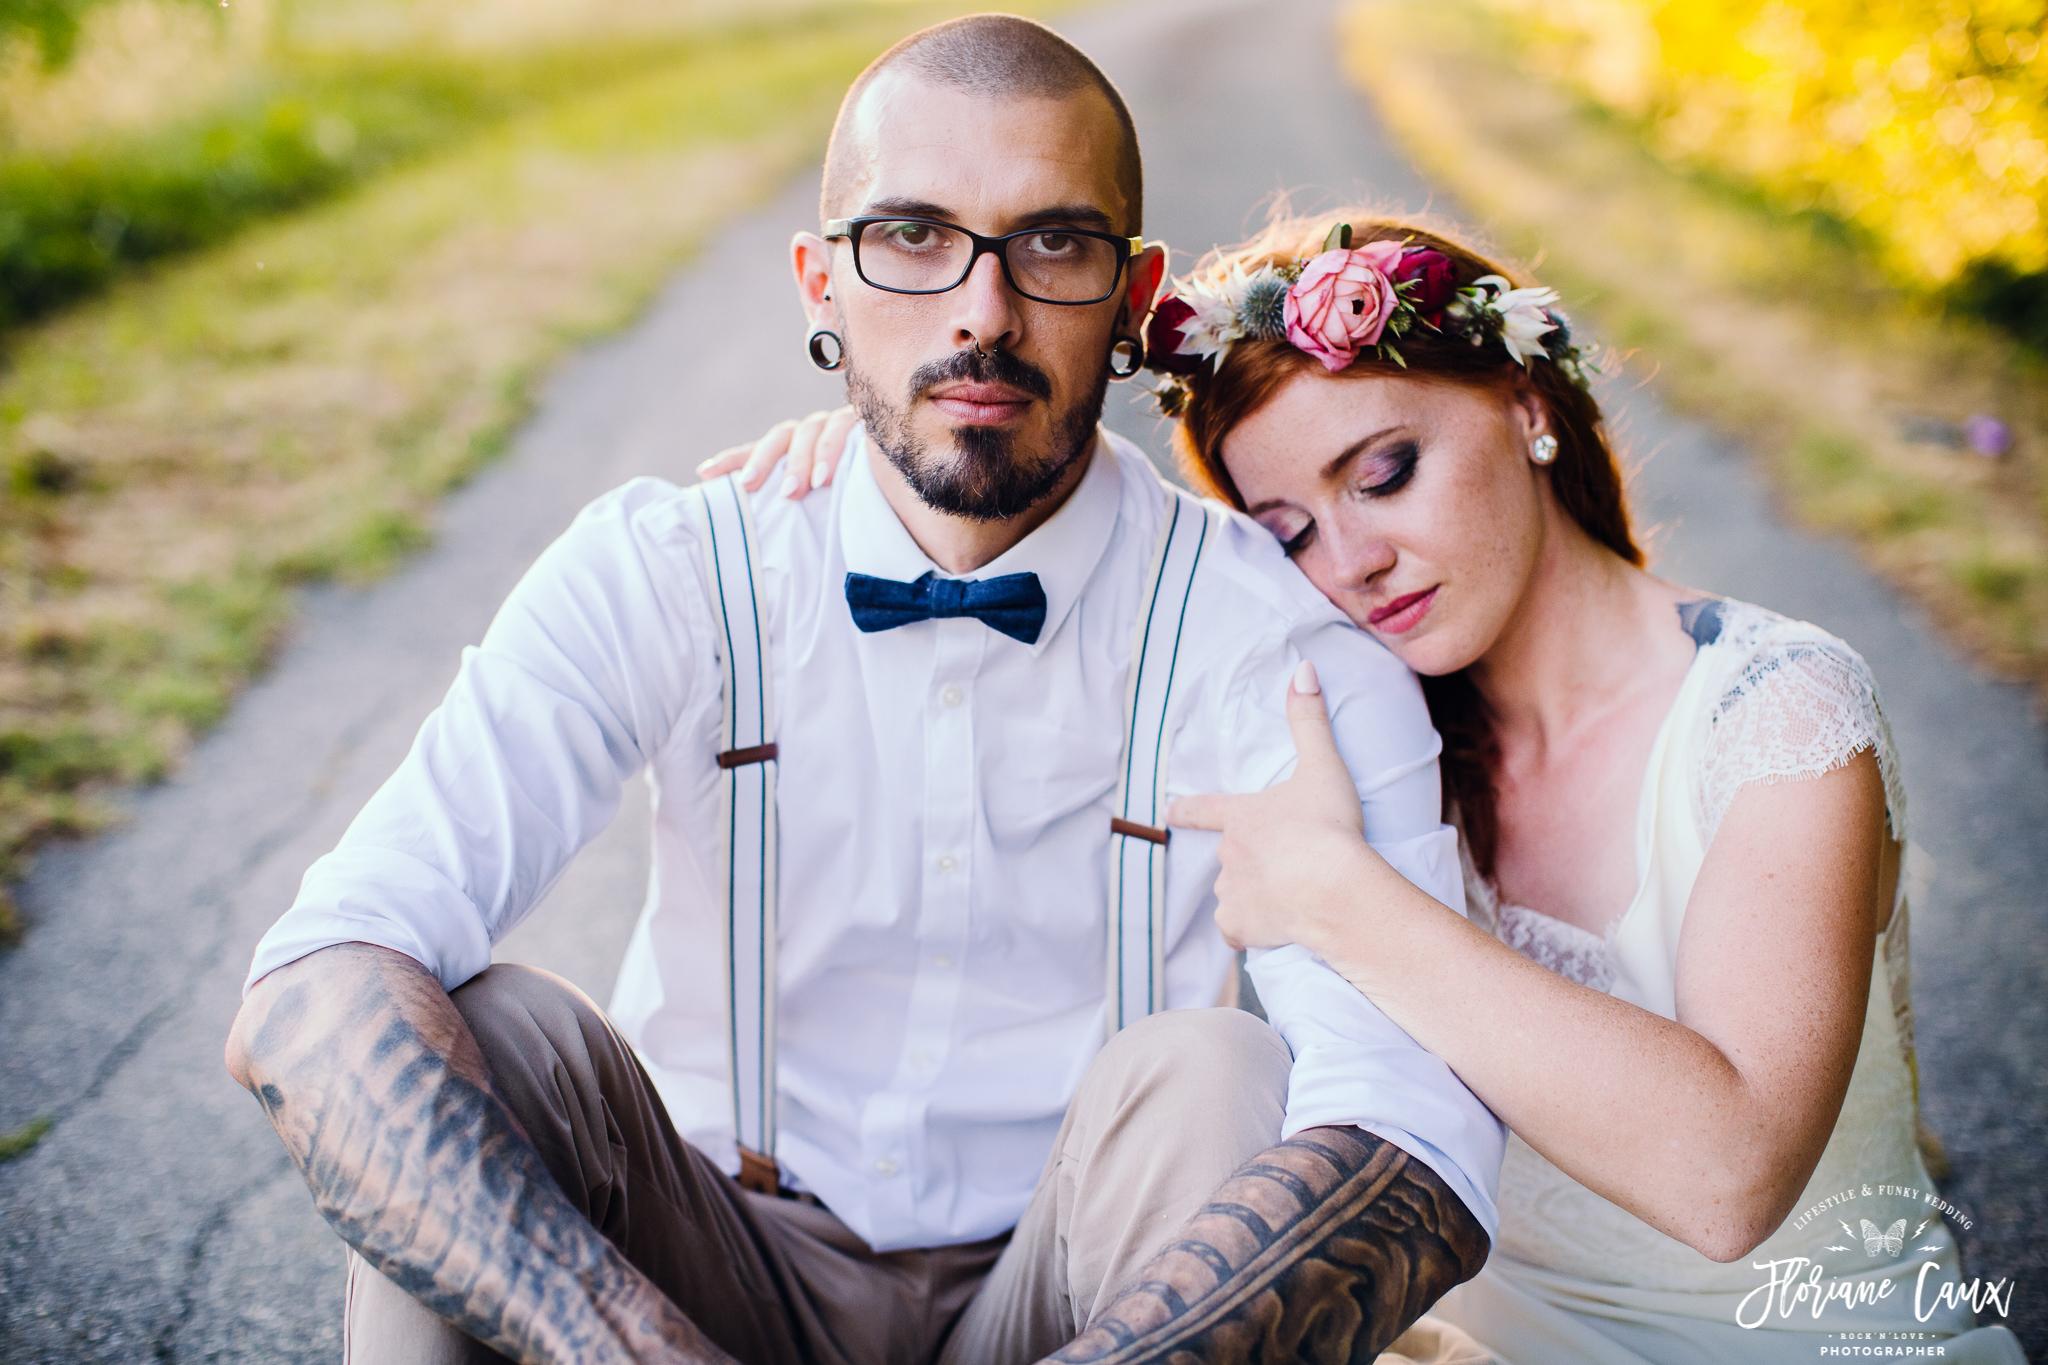 photographe-mariage-toulouse-rocknroll-maries-tatoues-floriane-caux-68